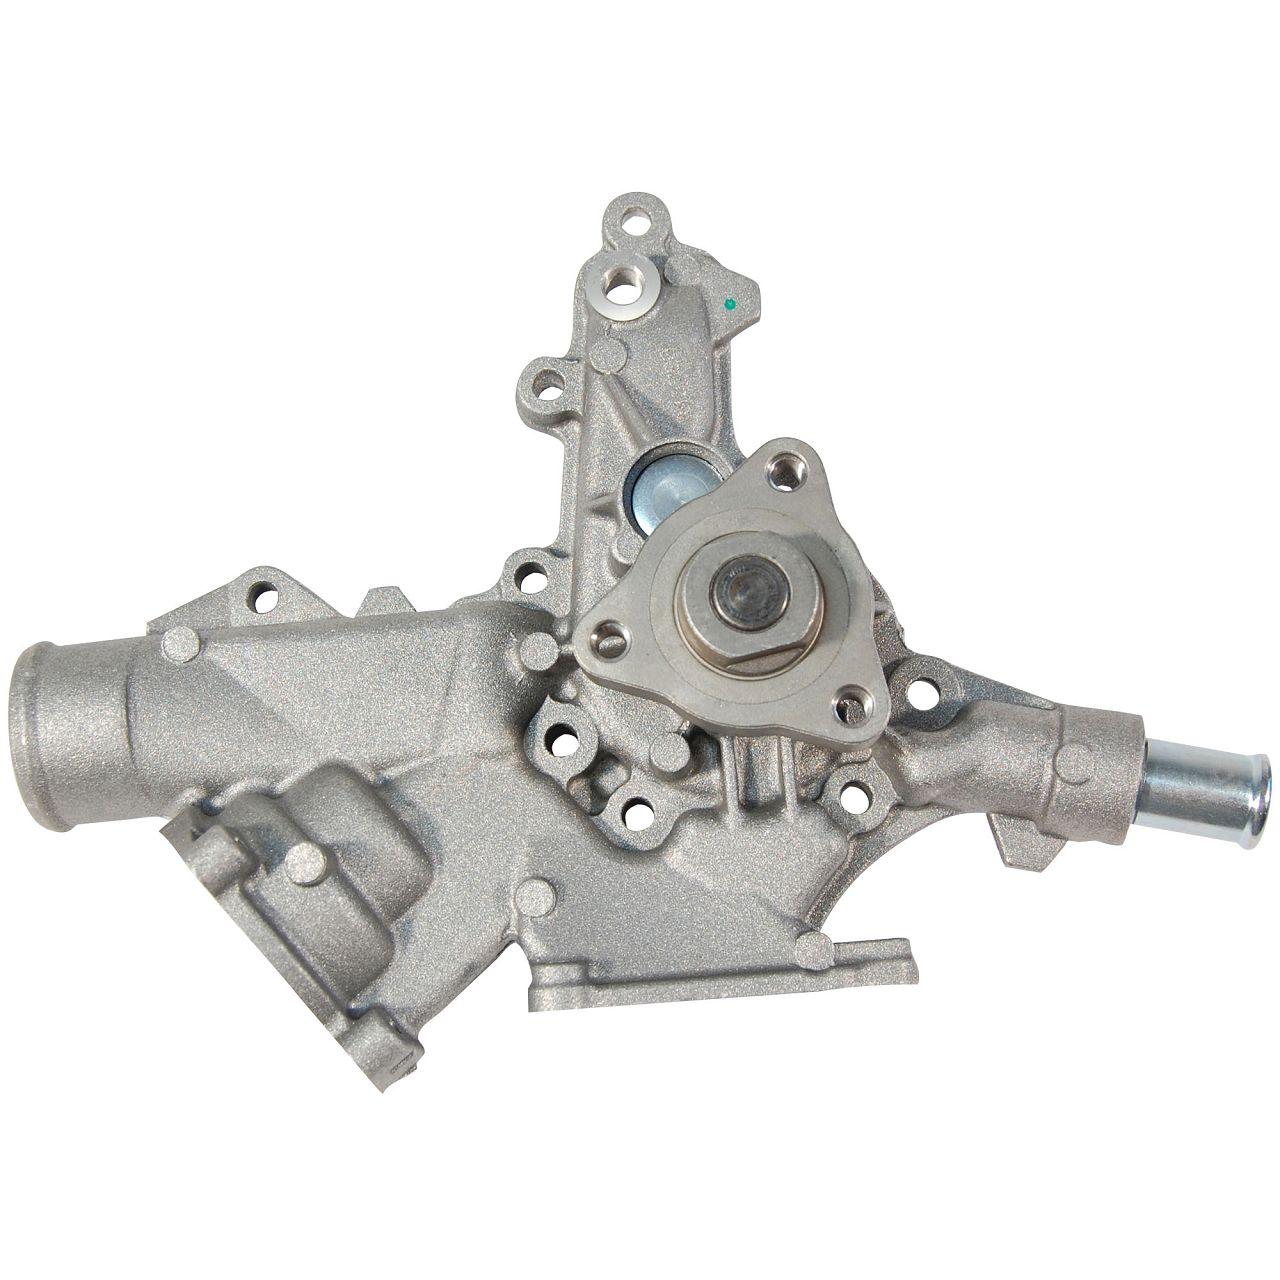 SIL Wasserpumpe Kühlwasserpumpe OPEL Agila A Astra G H Corsa B C 1.0 1.2 SUZUKI Wagon R